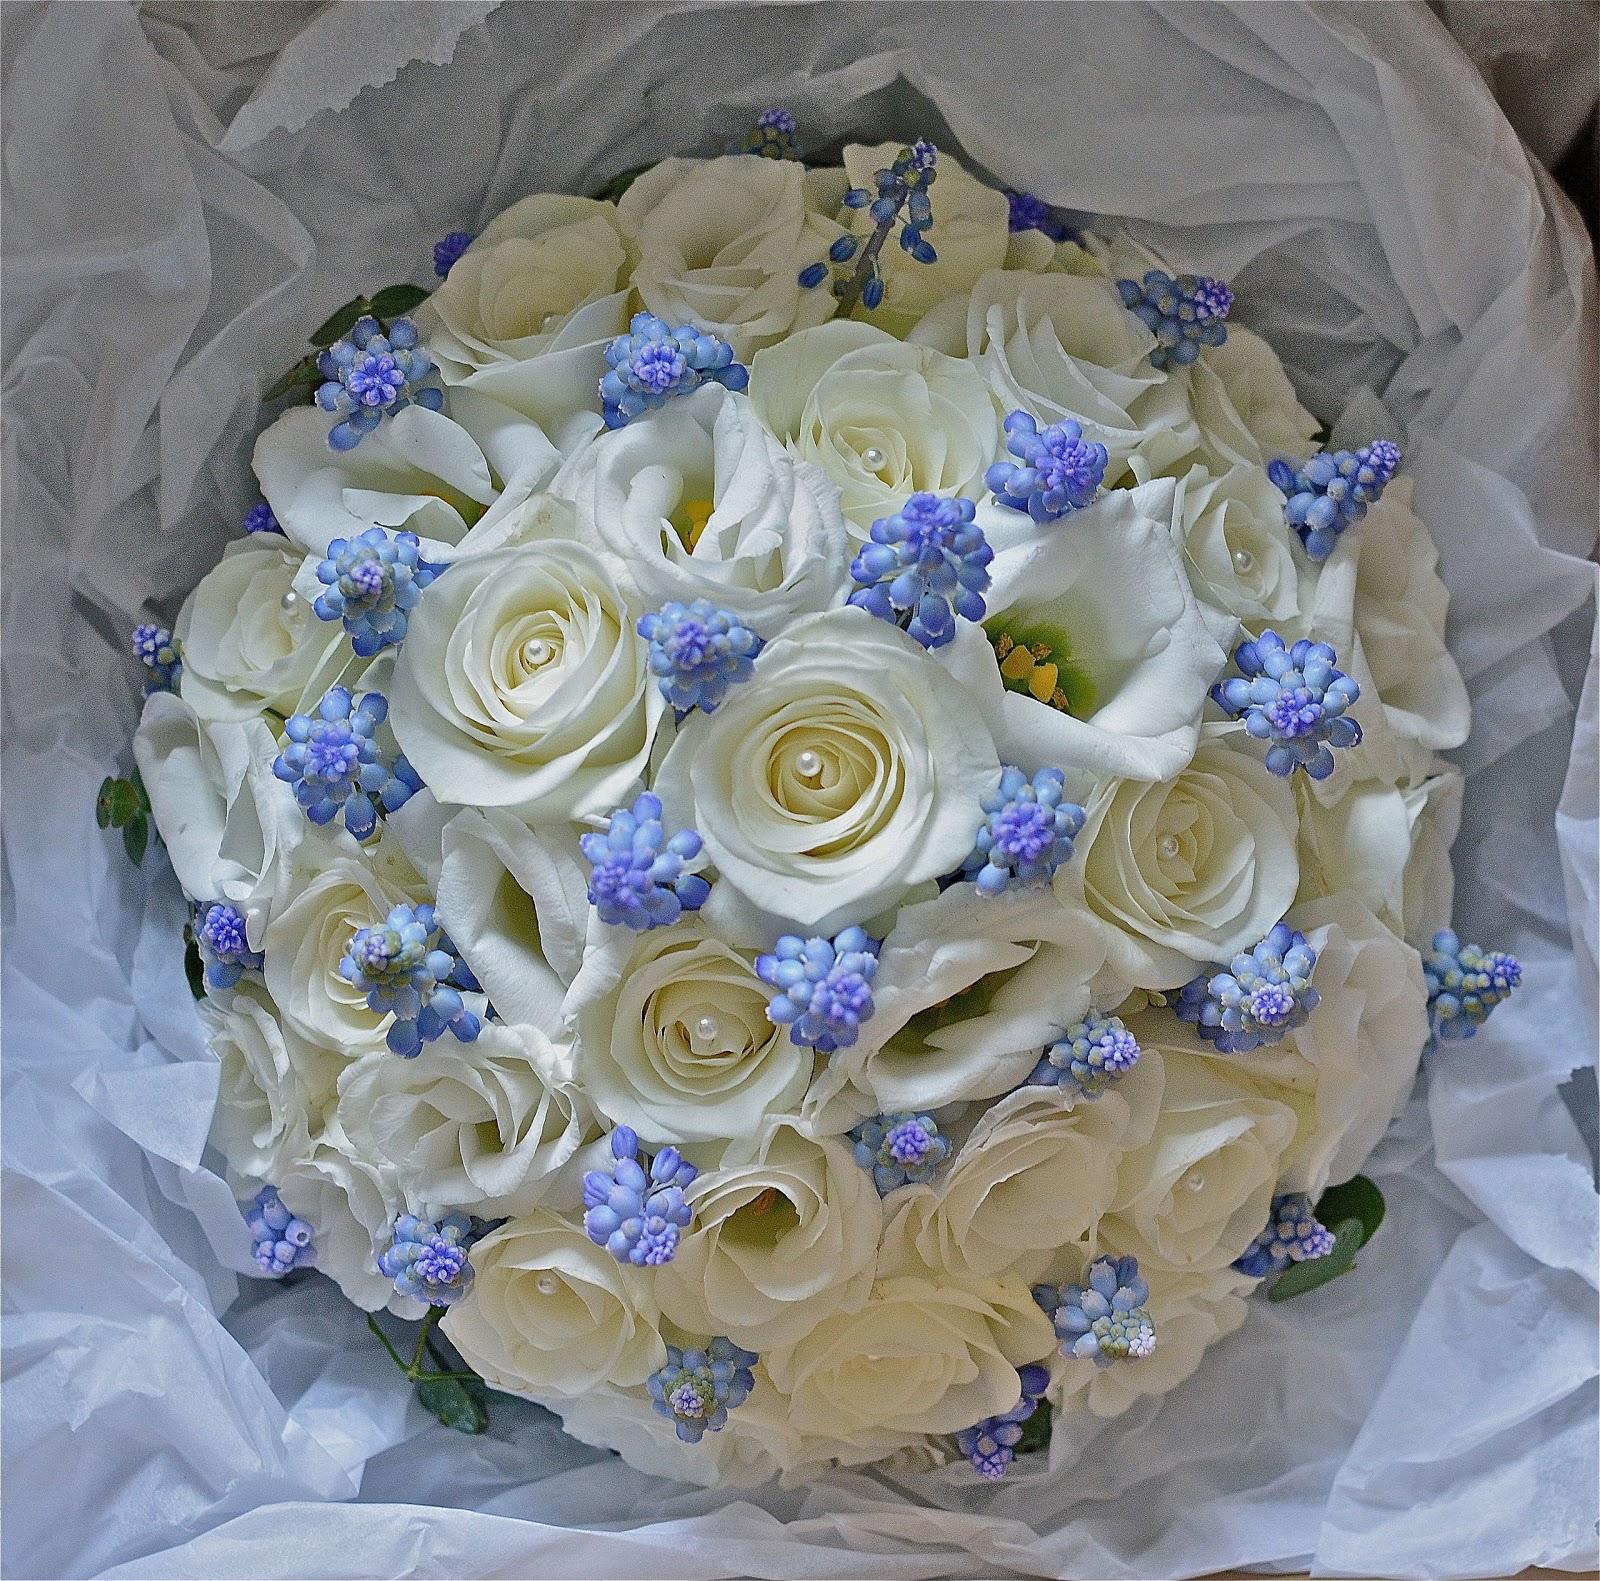 wedding flowers blog nicola 39 s blue and white spring flowers. Black Bedroom Furniture Sets. Home Design Ideas